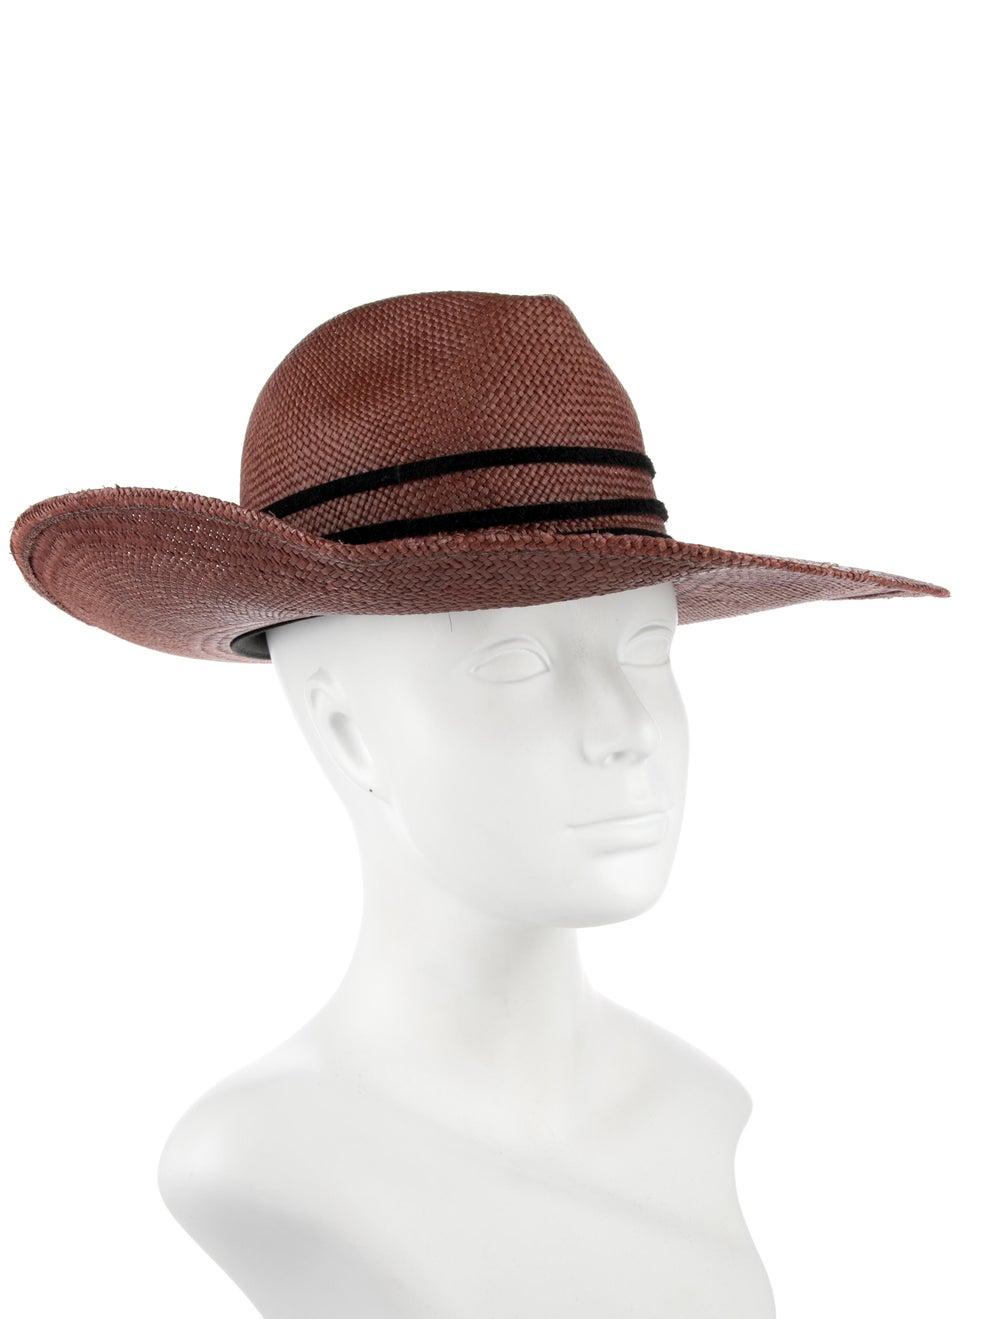 Janessa Leone Straw Fedora Hat red - image 3